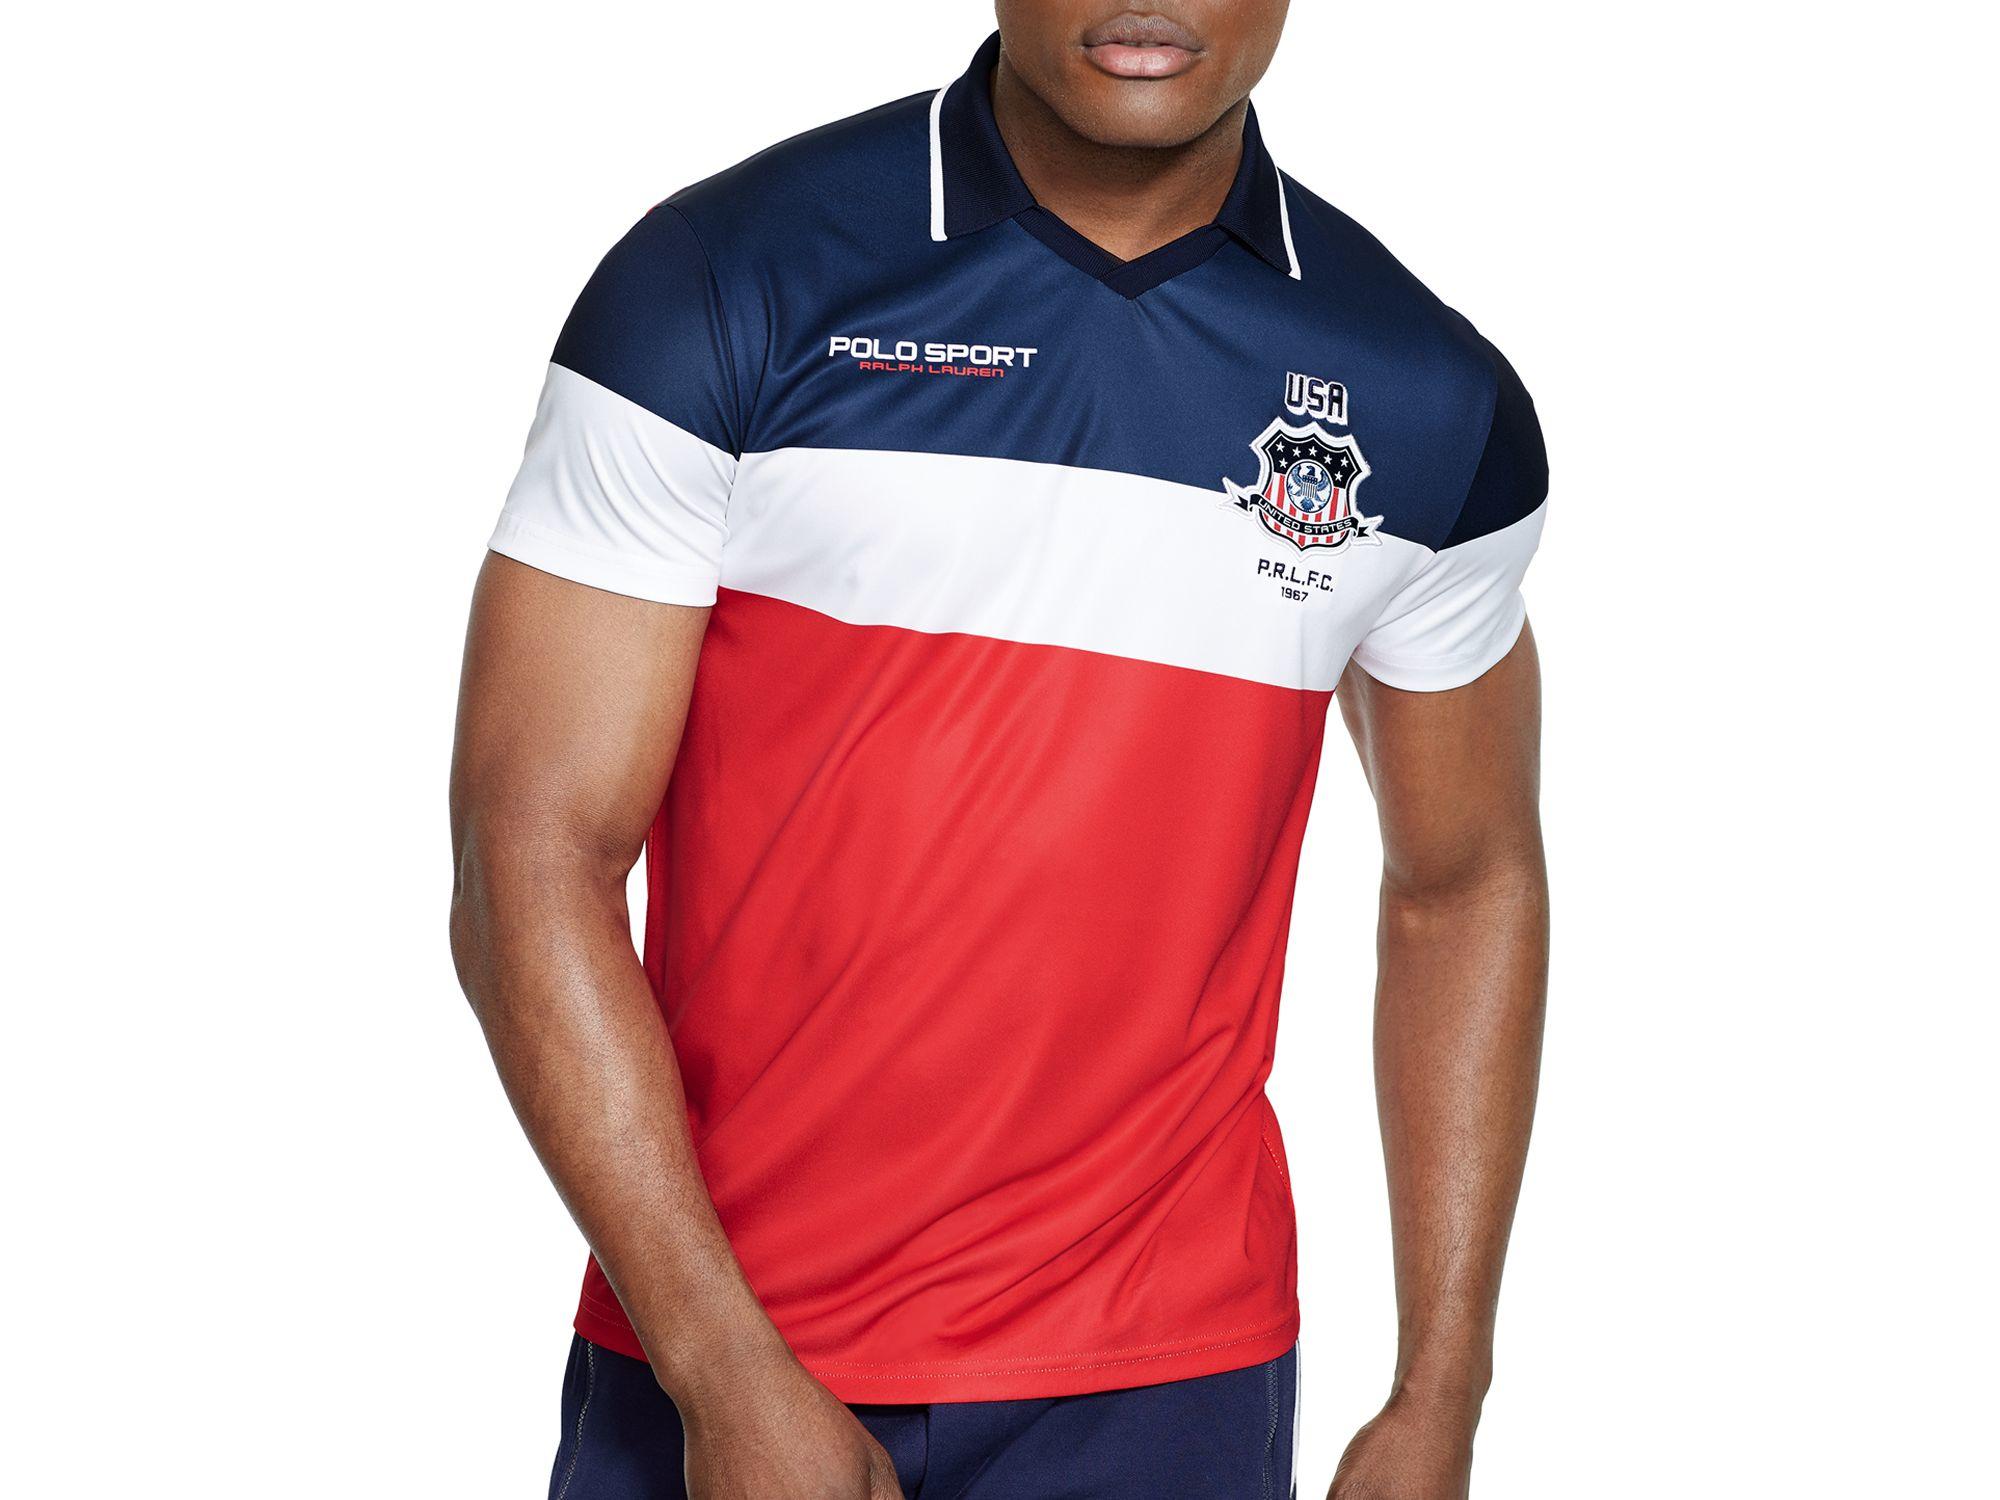 Sport Polo Usa For Men Lauren Jersey Ralph Red Shirt Color Blocked trCsdhQ